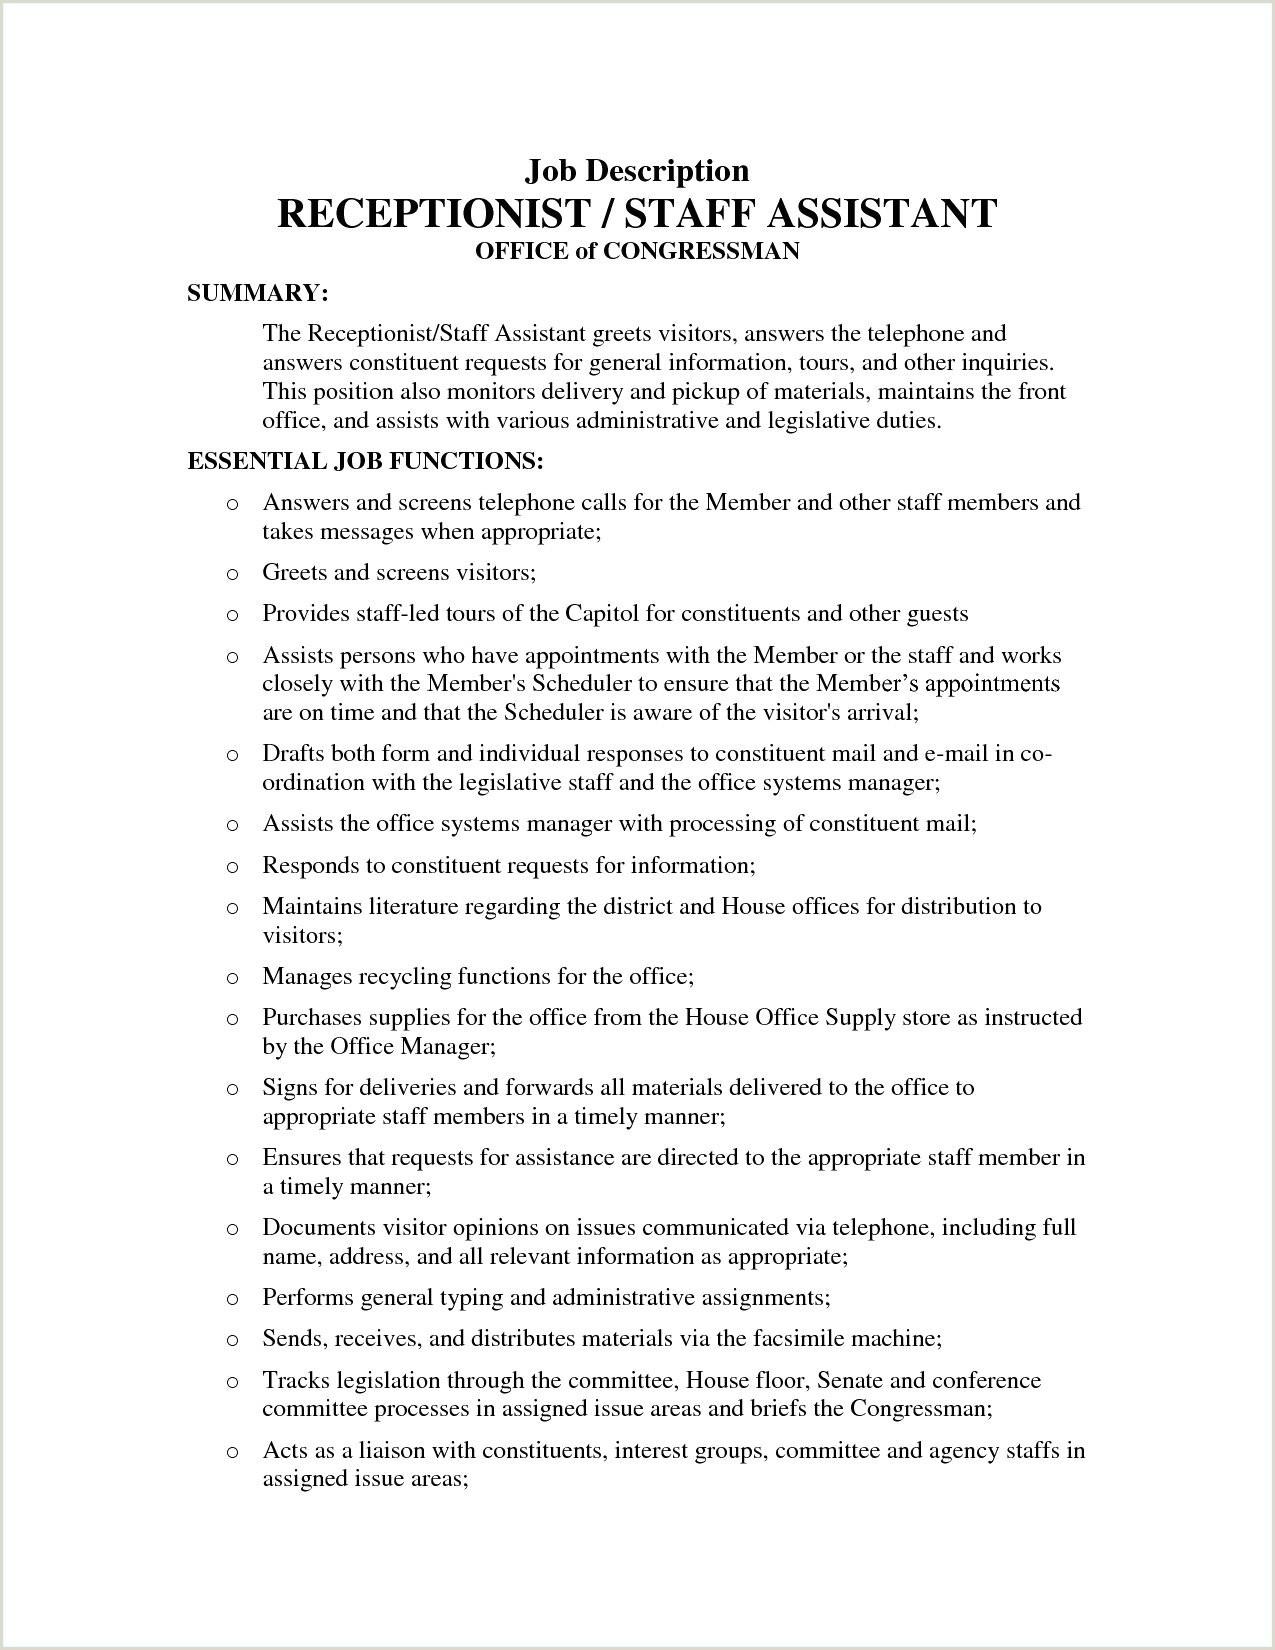 Cv Examples for Receptionist Job Reception Job Description Resume Best Resume Samples for